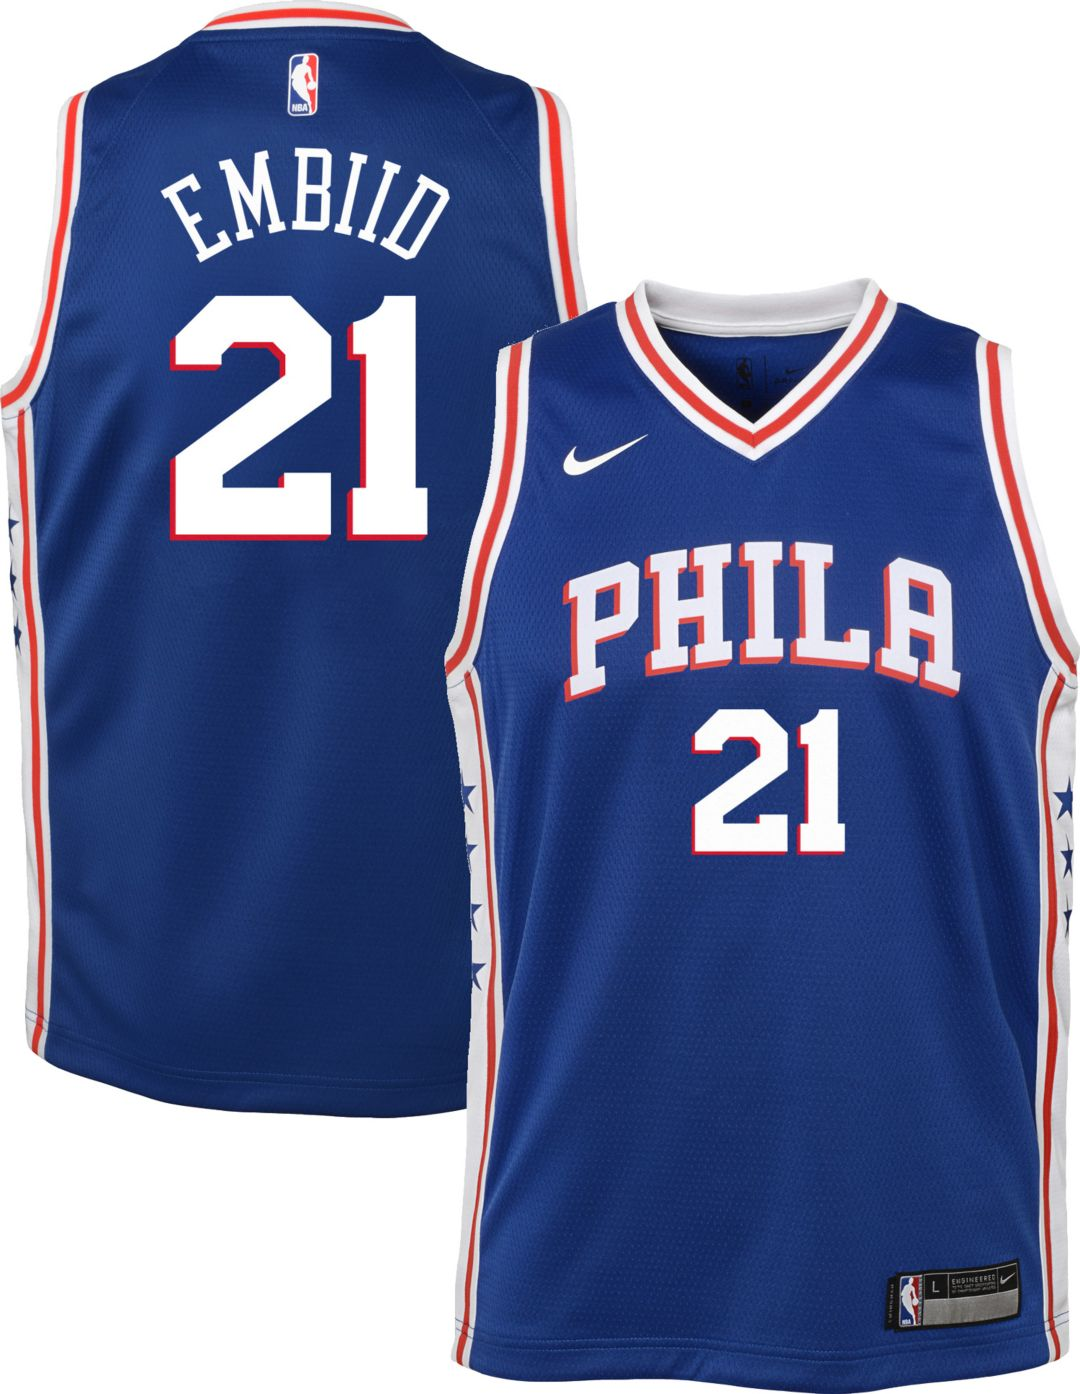 db07615c2 Nike Youth Philadelphia 76ers Joel Embiid #21 Royal Dri-FIT Swingman Jersey.  noImageFound. Previous